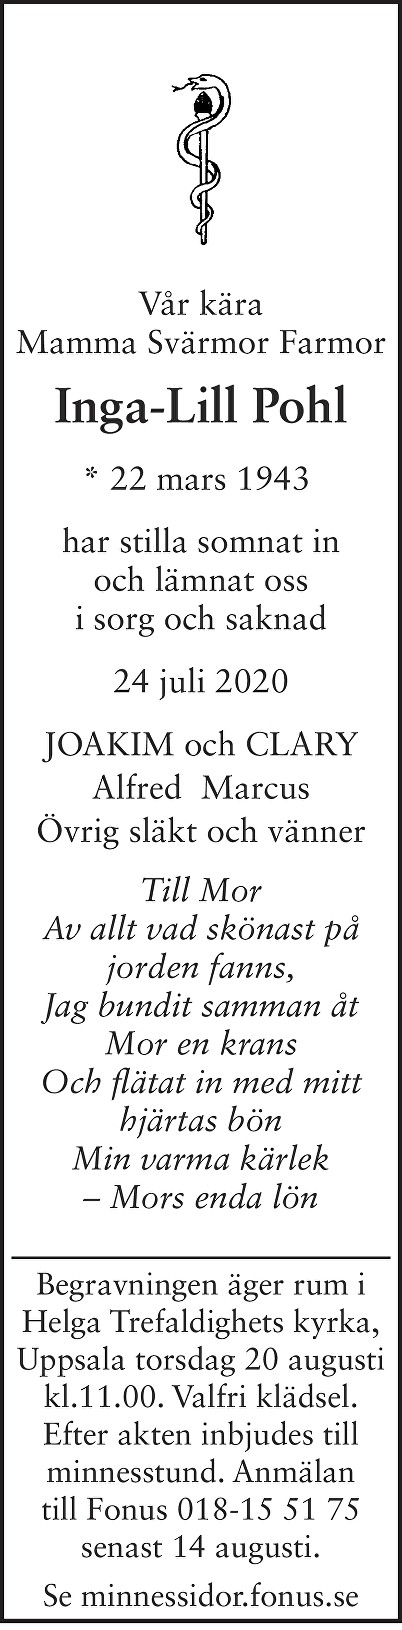 Inga-Lill Pohl Death notice